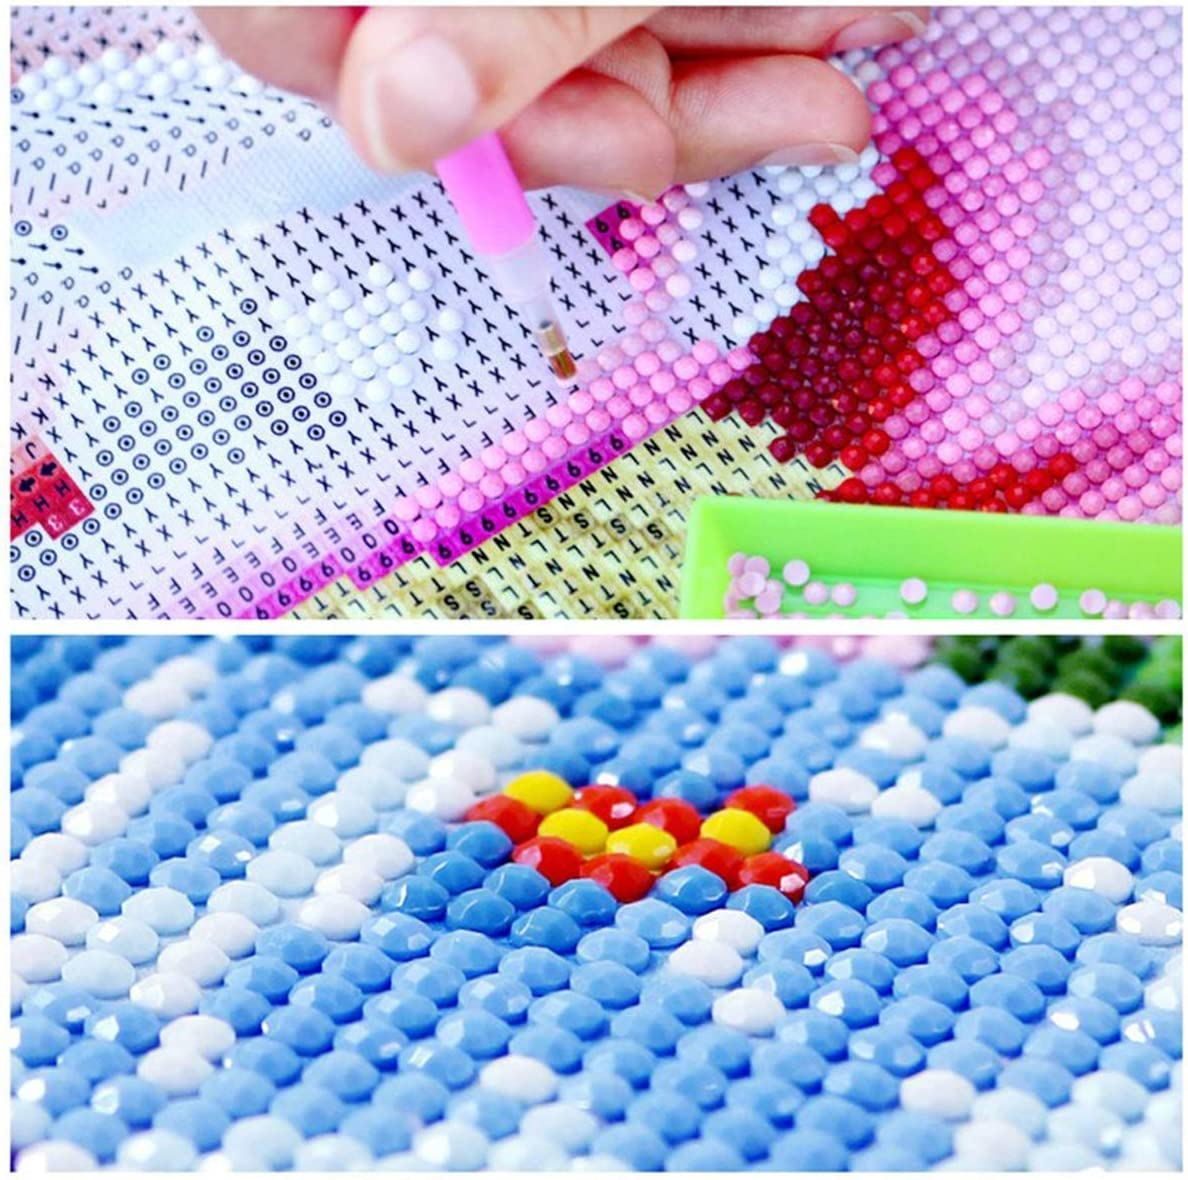 sancuanyi 2 Packung 5D Diamant Painting Full Drill Set 30 * 40 cm DIY Diamond Painting Schmetterling Kreuz Stich Diamond Dekoration f/ür Home Wall D/écor